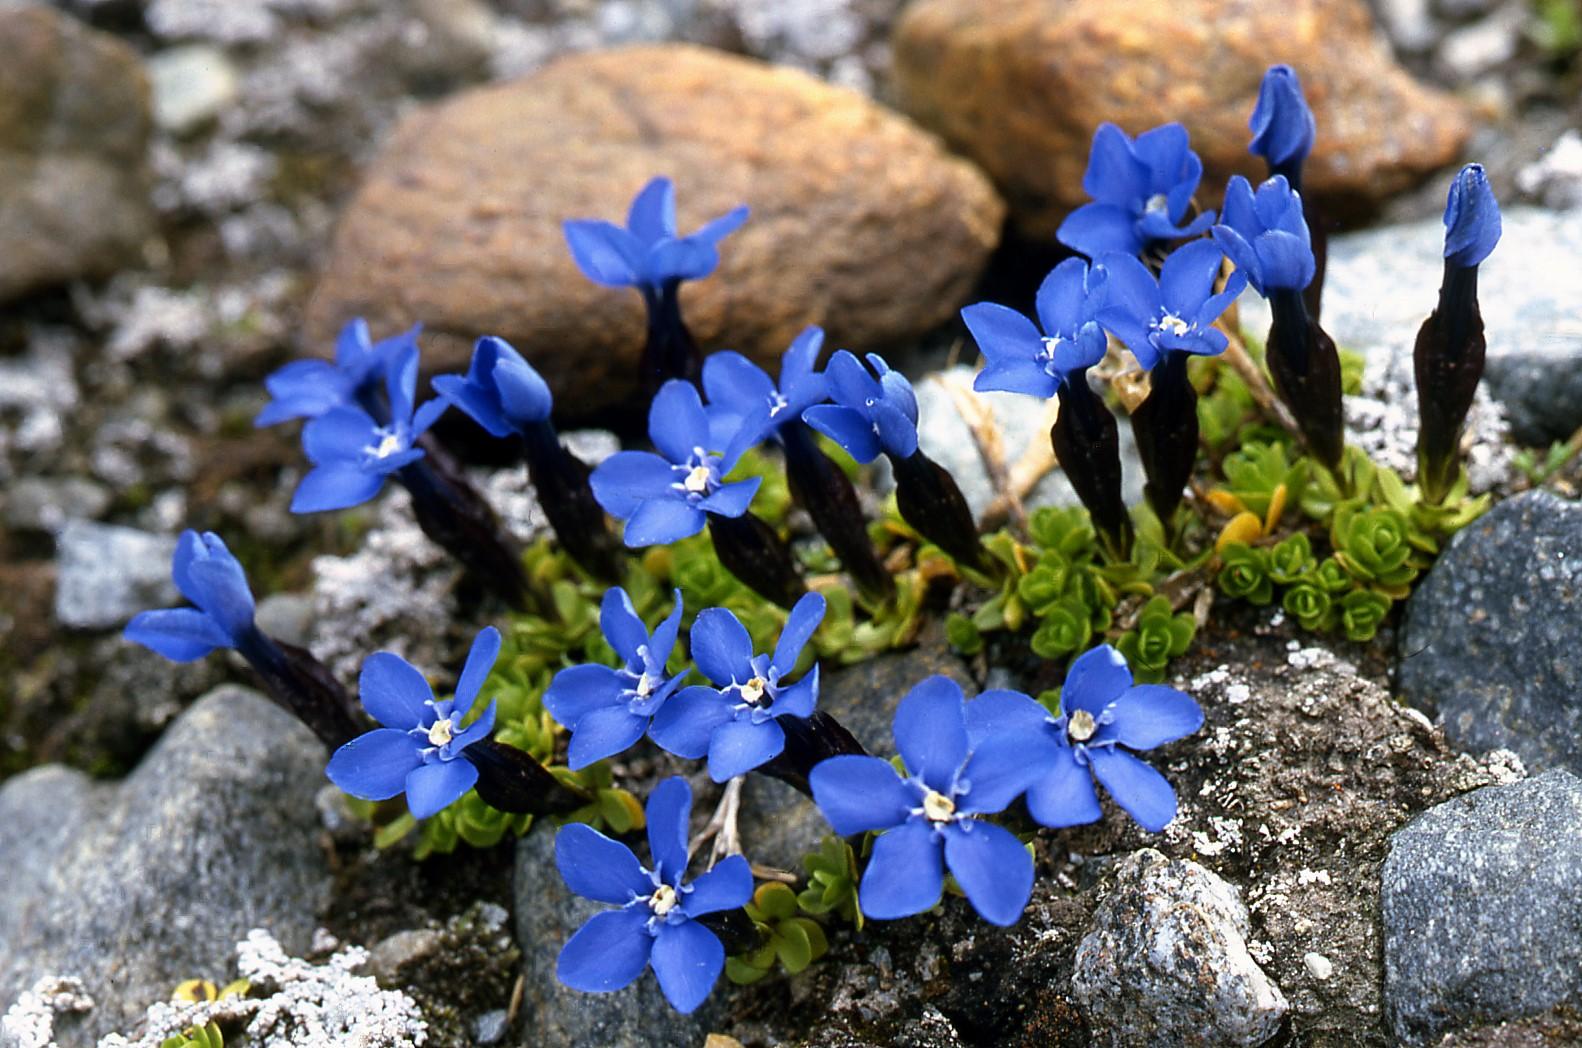 Gentiana-bavarica-ssp-imbricata-2